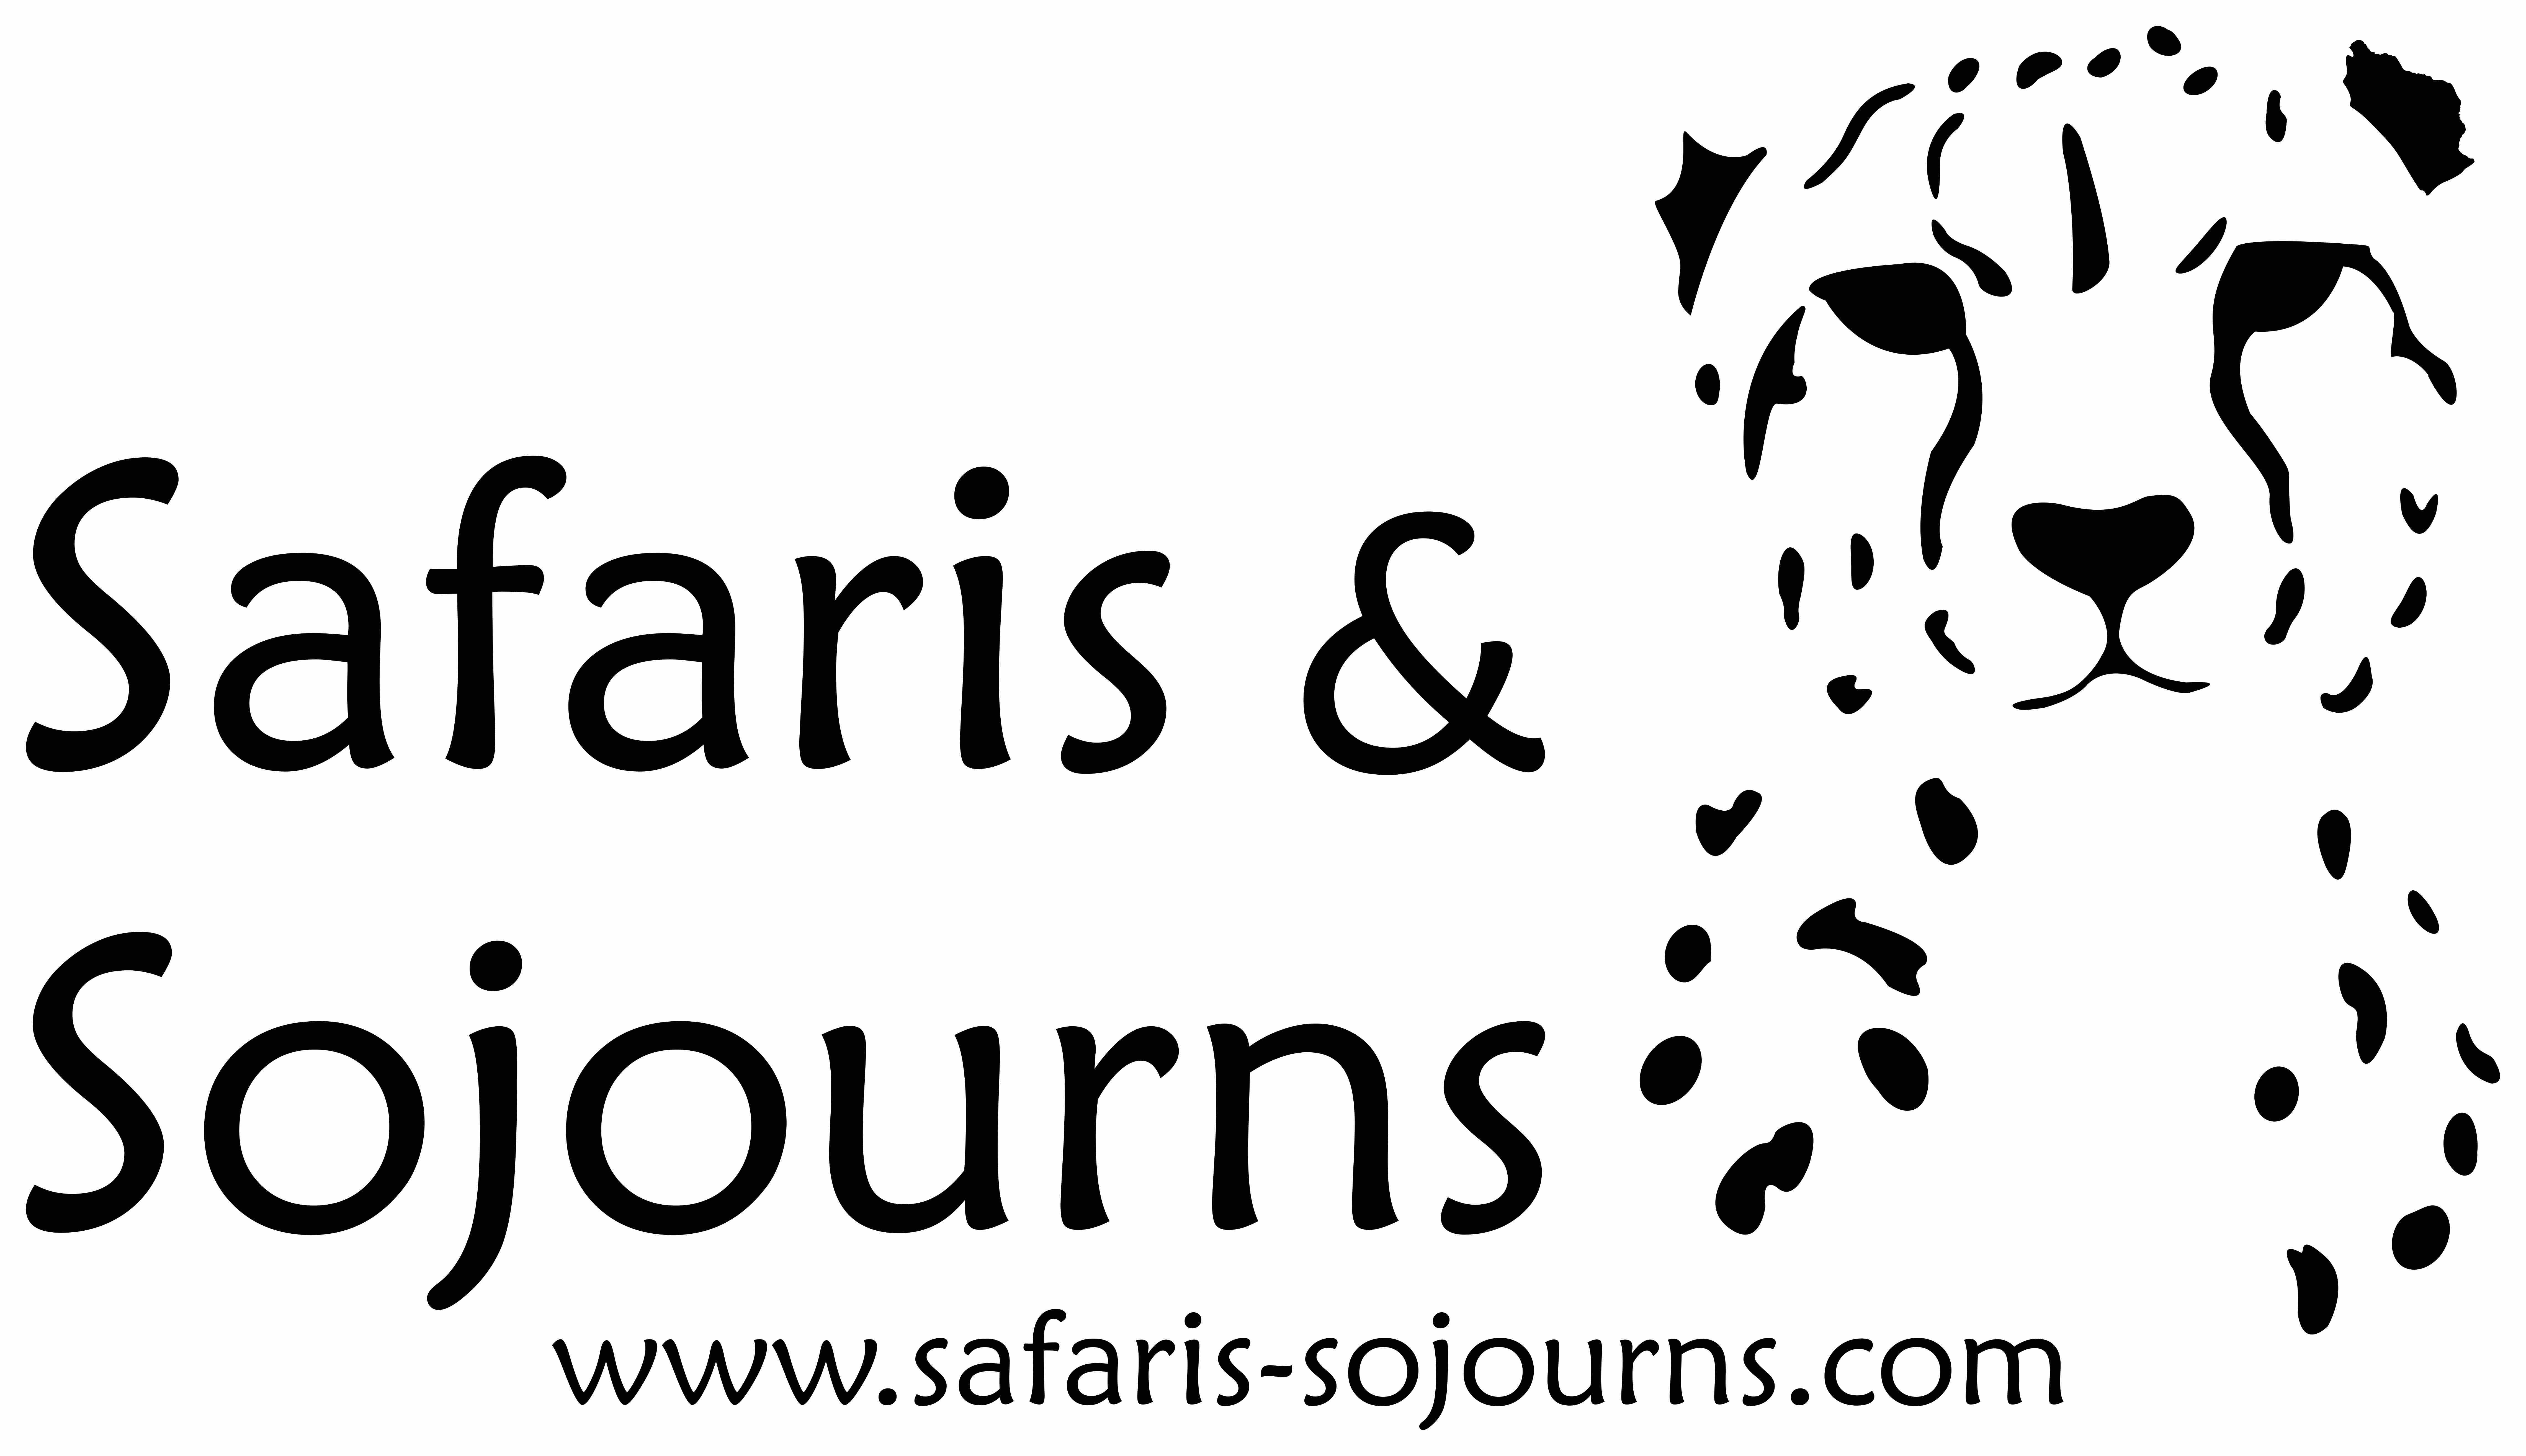 Safaris & Sojourns, IL, USA